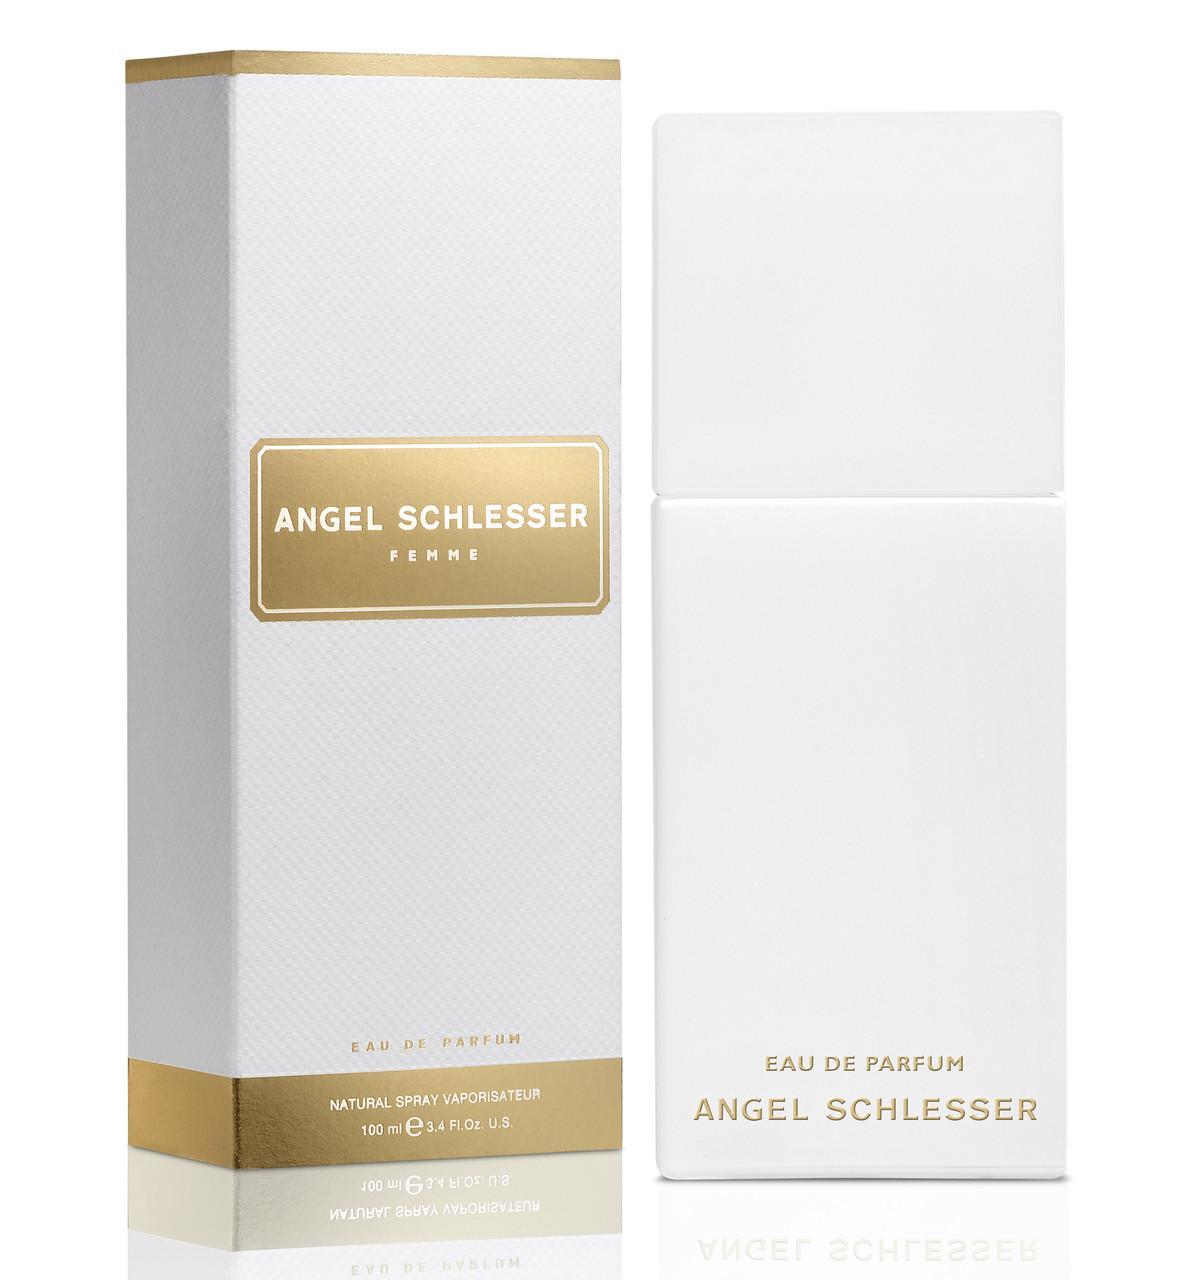 Духи женские Angel Schlesser Femme Eau de Parfum  (Ангел Шлессер Фемм де парфюм)